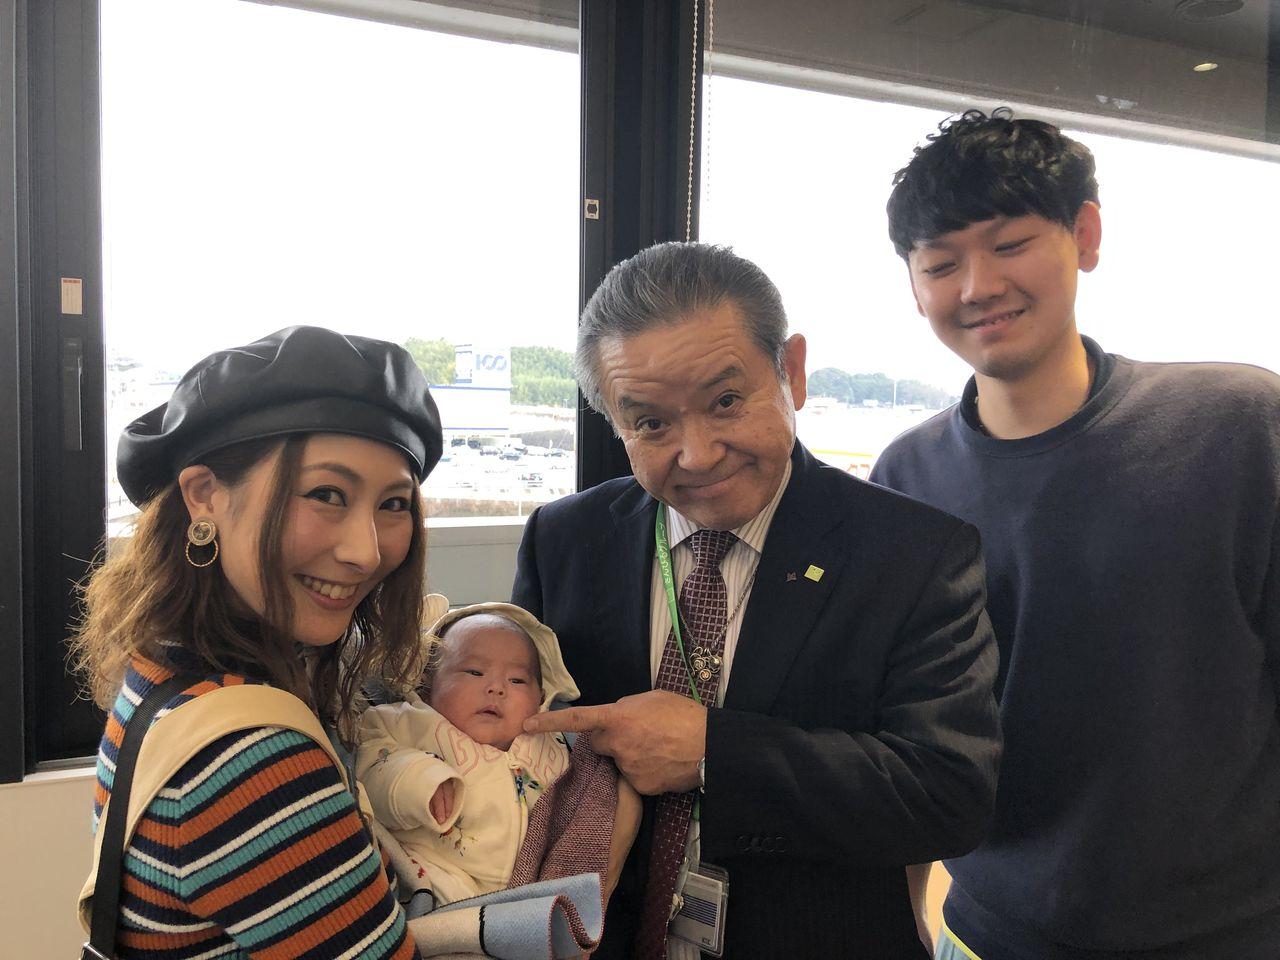 IMG_3750 山本勇希・喜美子夫妻と紡(つむぎ)ちゃん